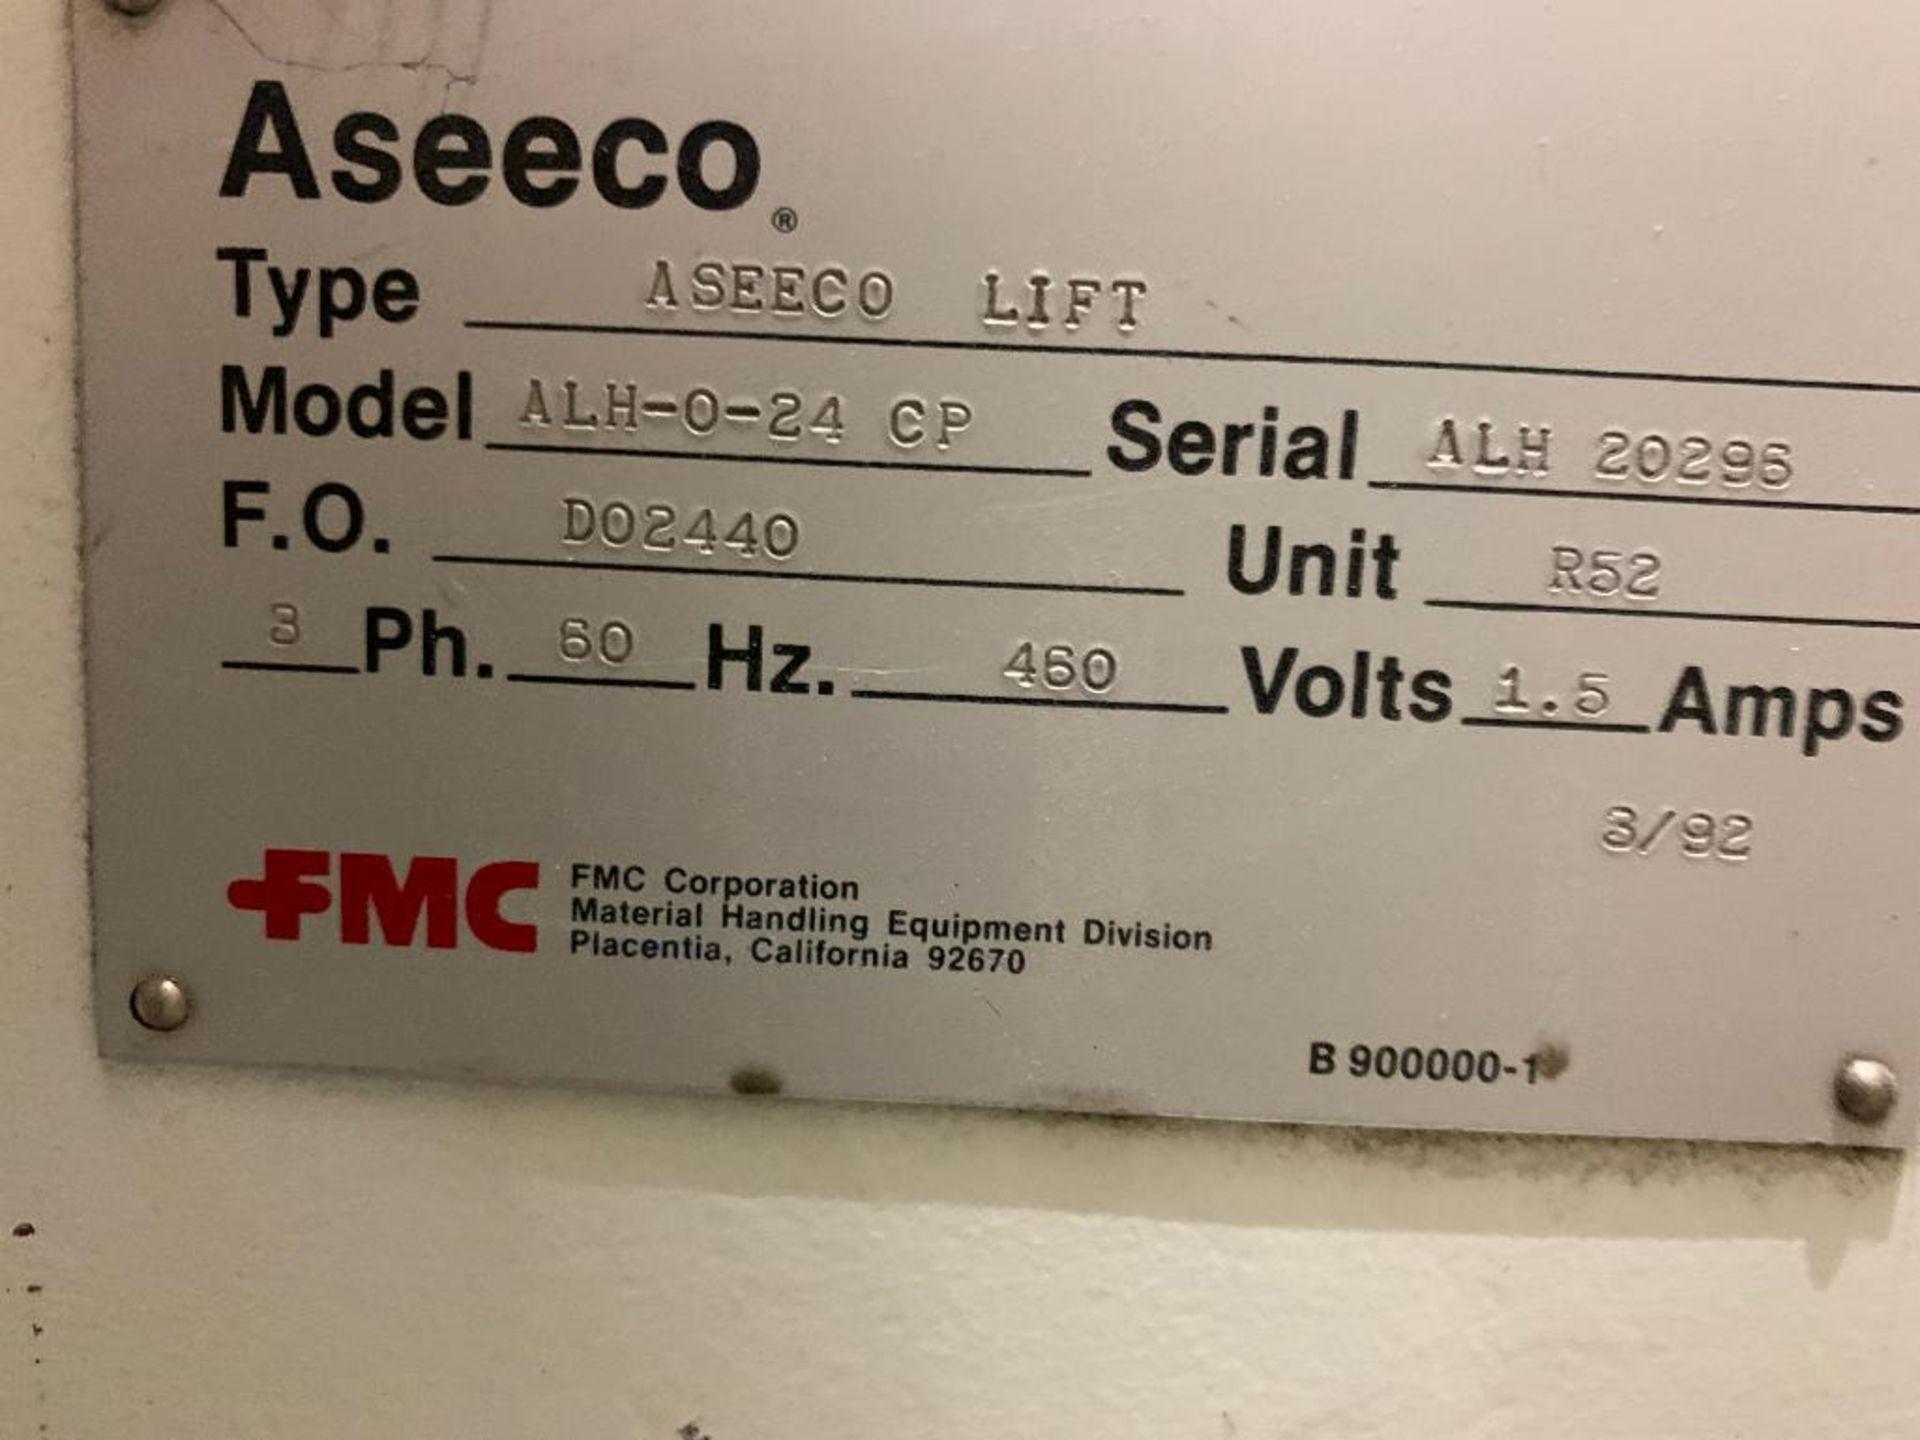 1990 Aseeco horizontal bucket elevator, model ALH-0-24 - Image 14 of 16